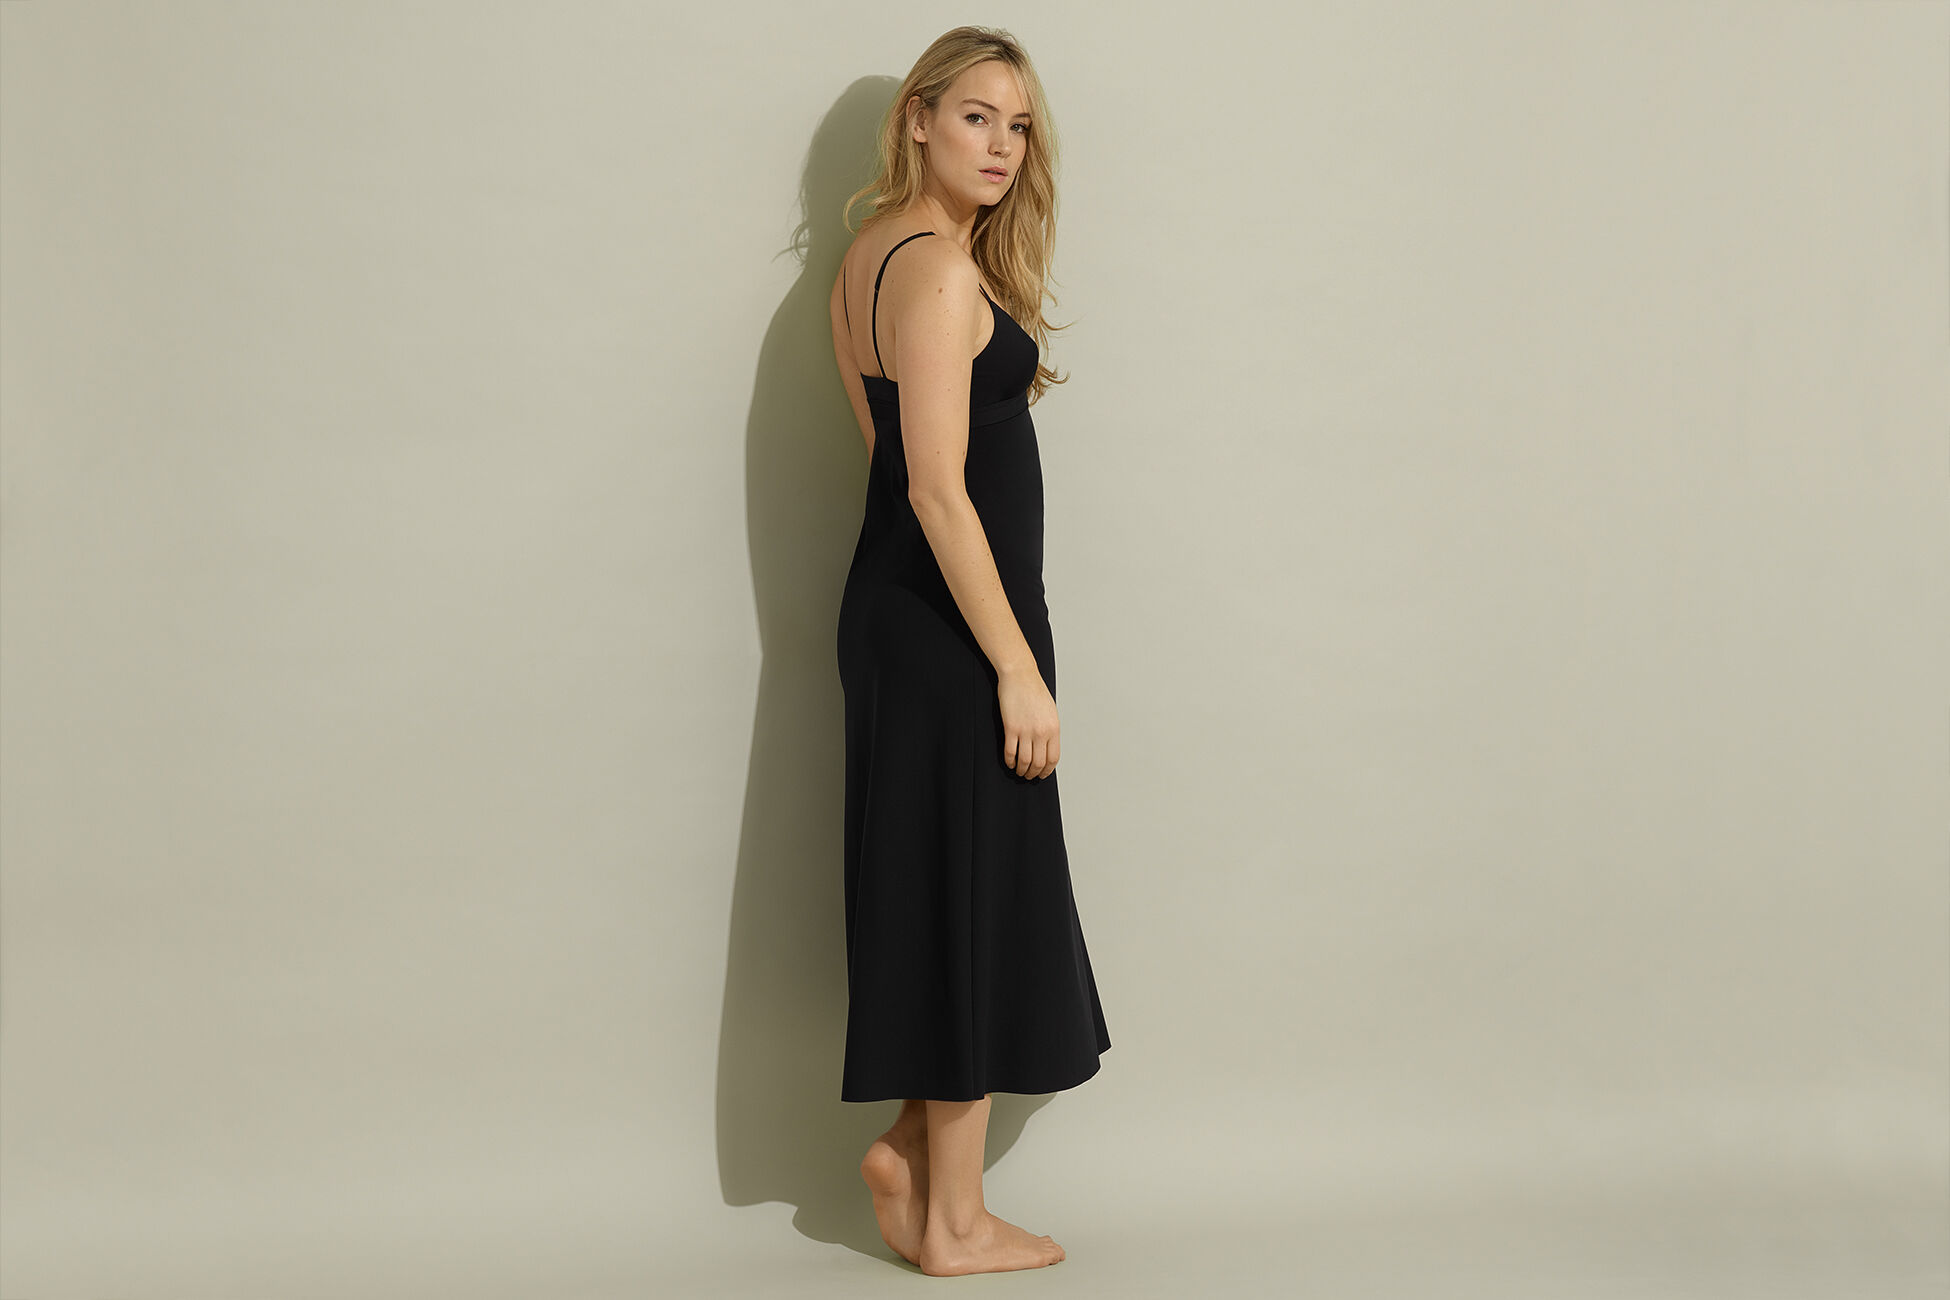 Silhouette longue Fond de robe vue standard �